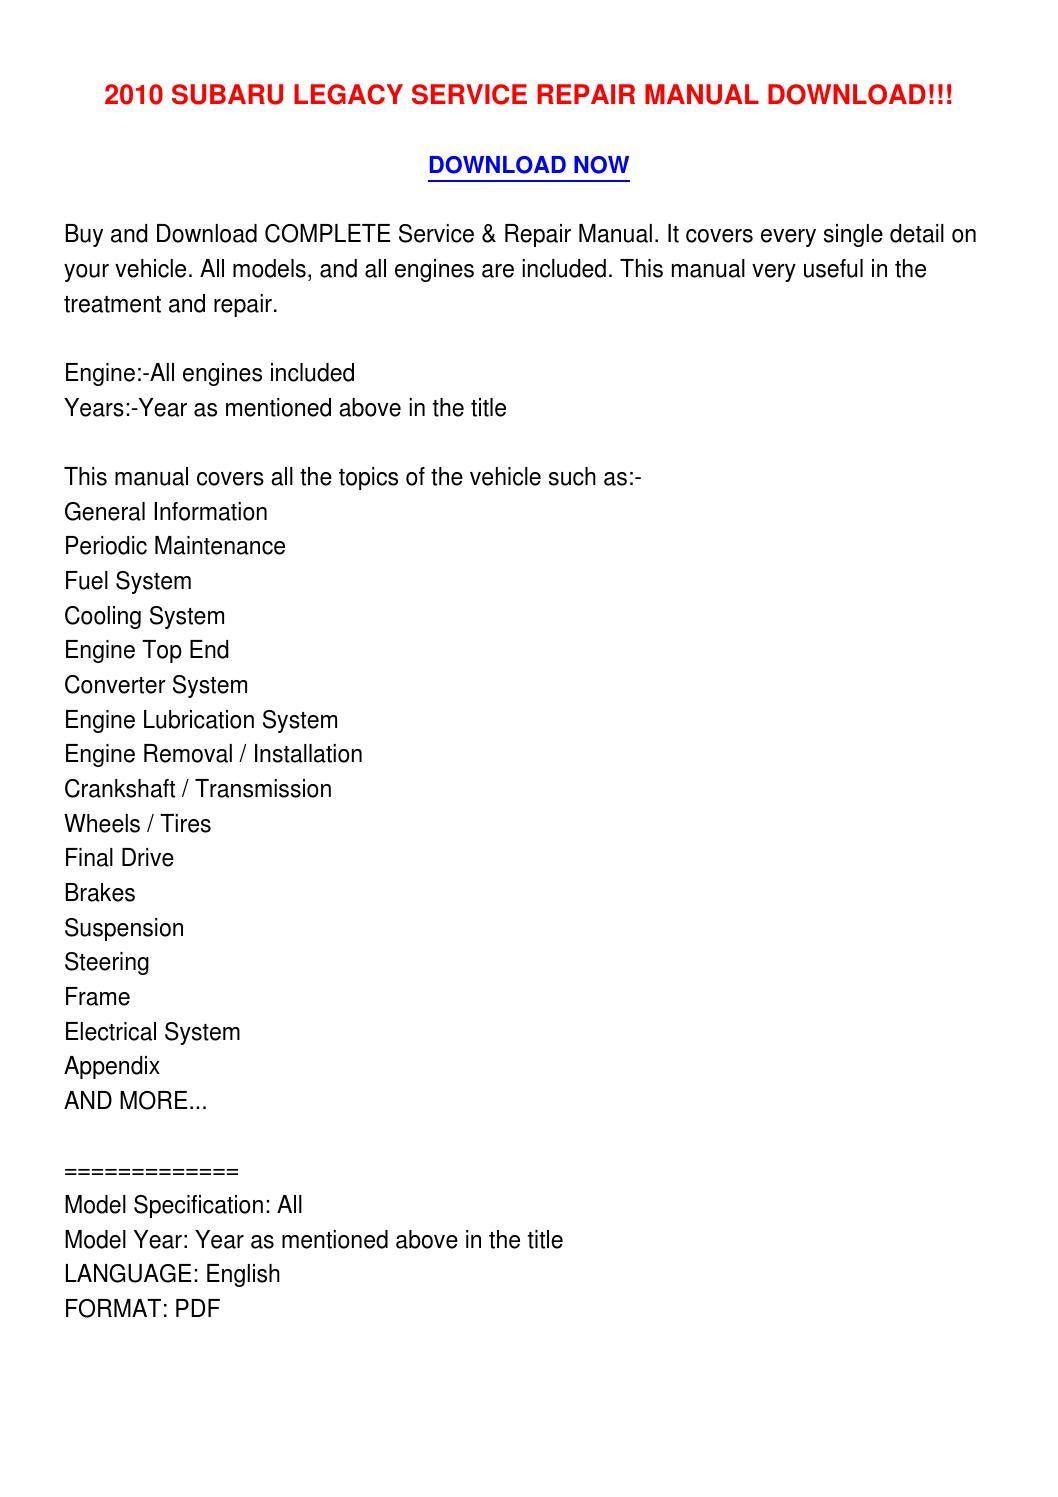 2010 subaru legacy service manual